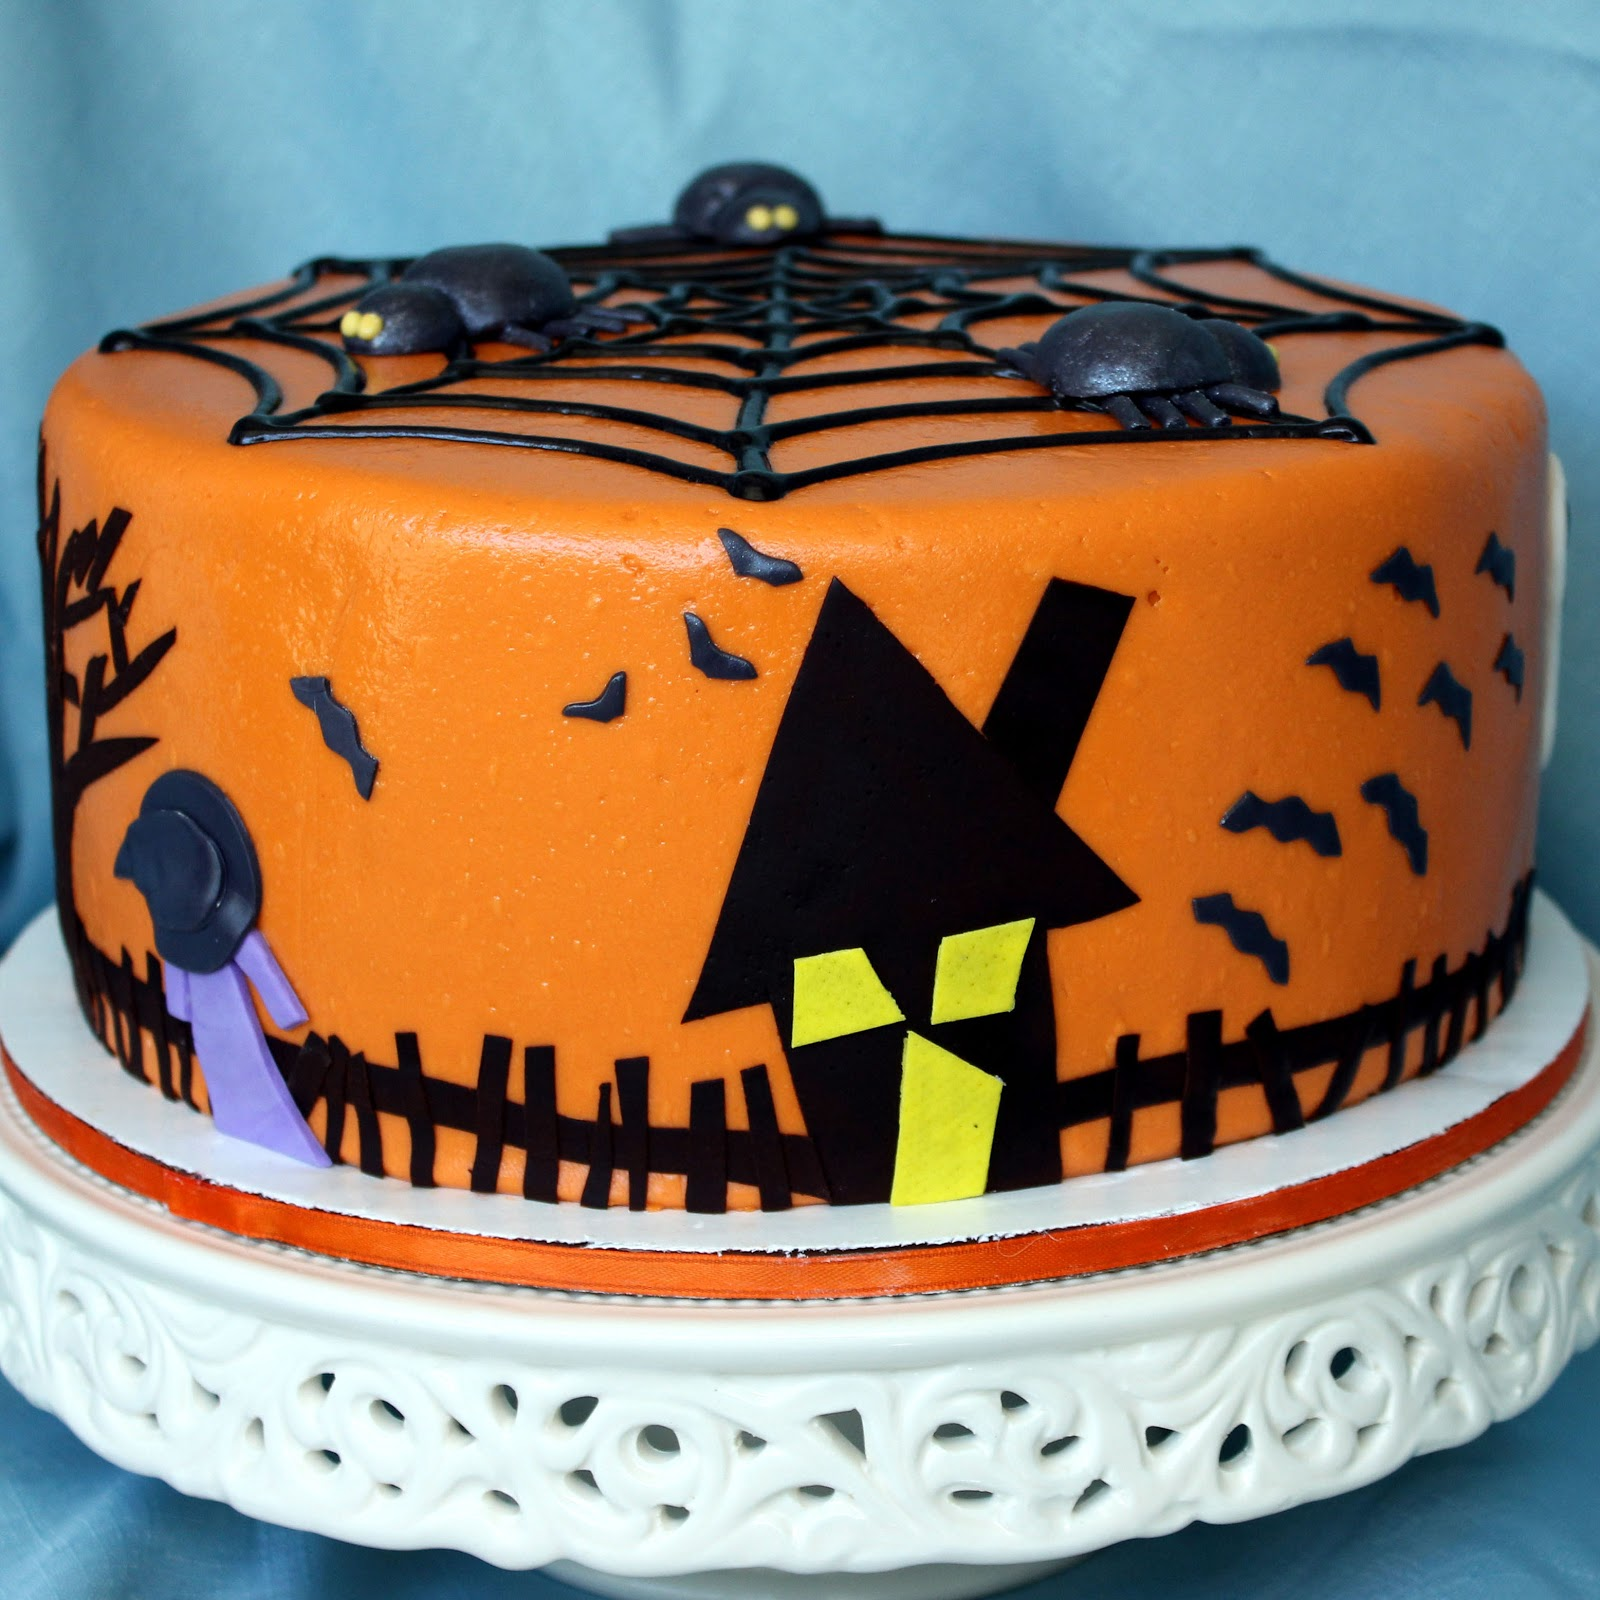 Cake Ideas For Halloween : Leelabean Cakes: A Frankenstorm Halloween